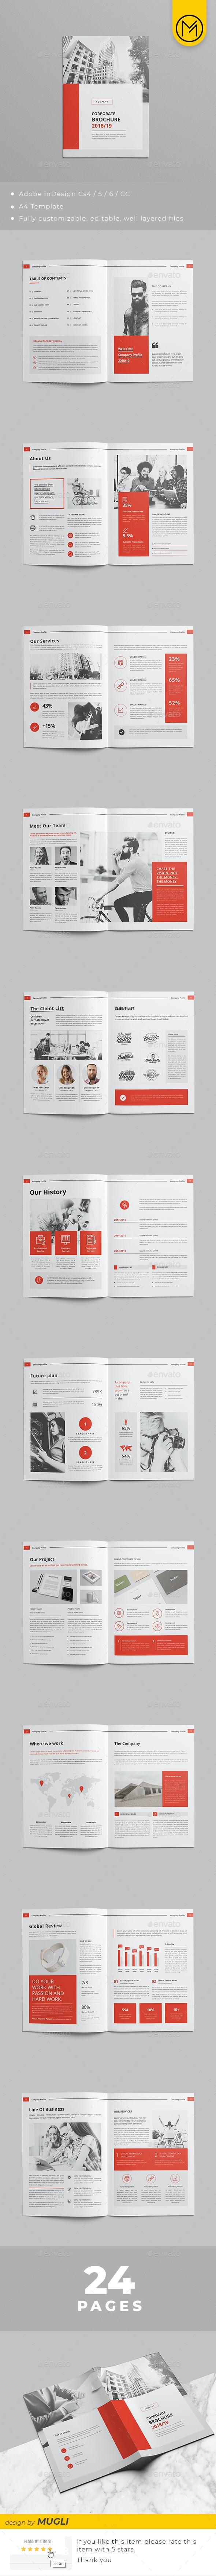 Corporate Brochure Design - Corporate Brochures